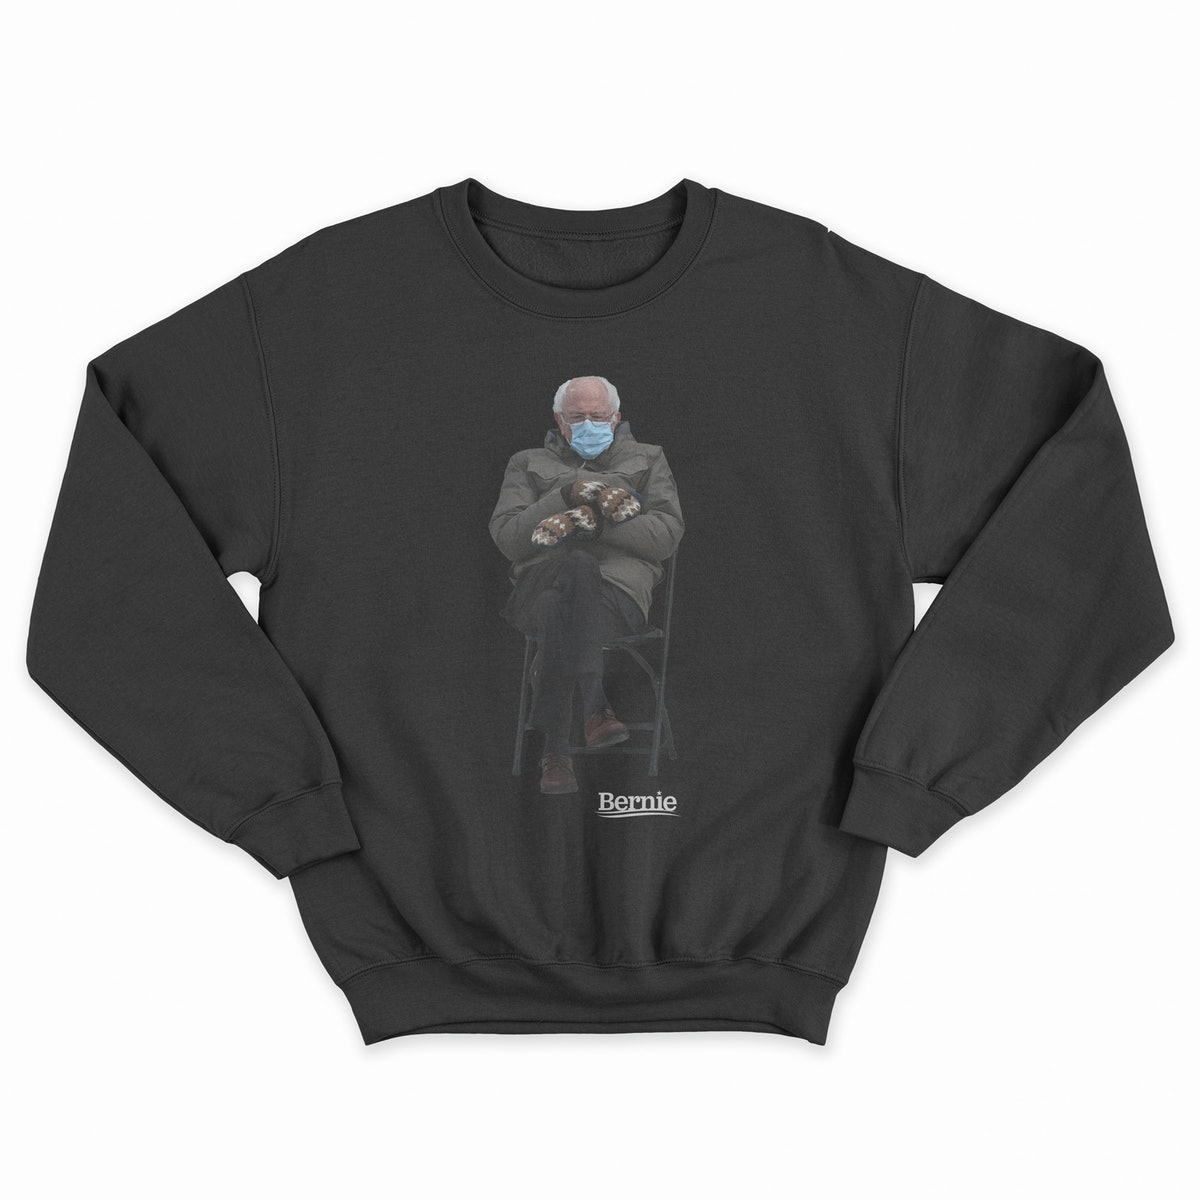 Bernie Sanders' inauguration meme sweatshirt launched for charity.